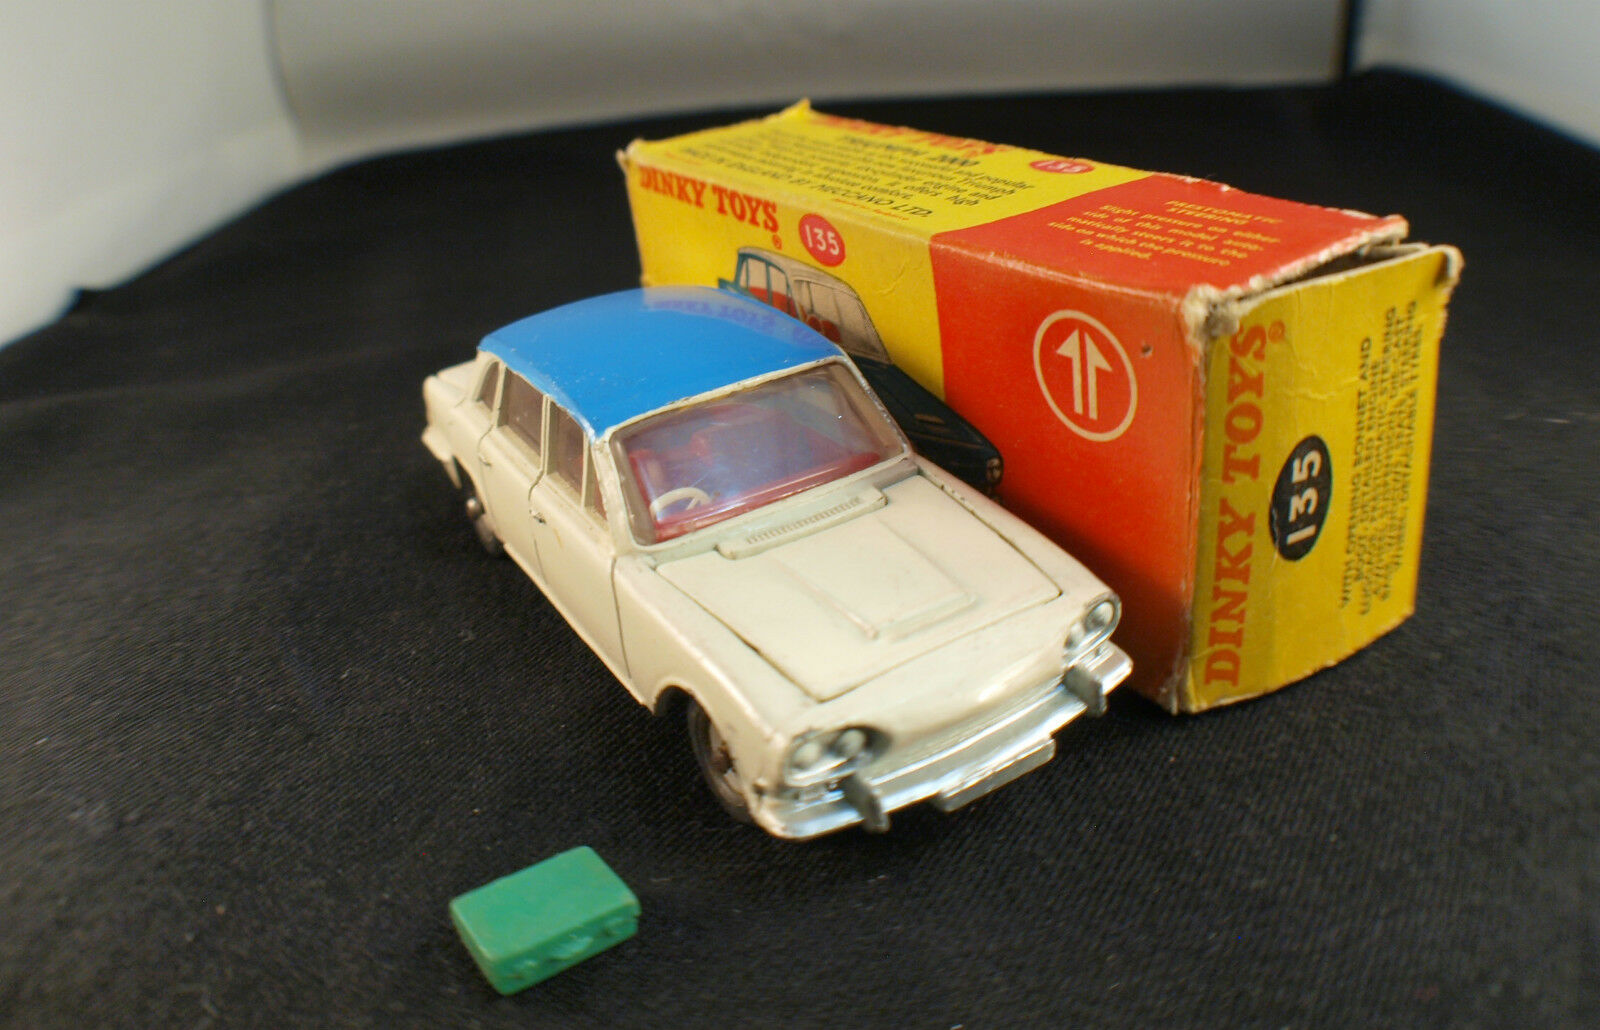 Dinky toys gb  triumph no. 135 2000 in box  juste pour toi